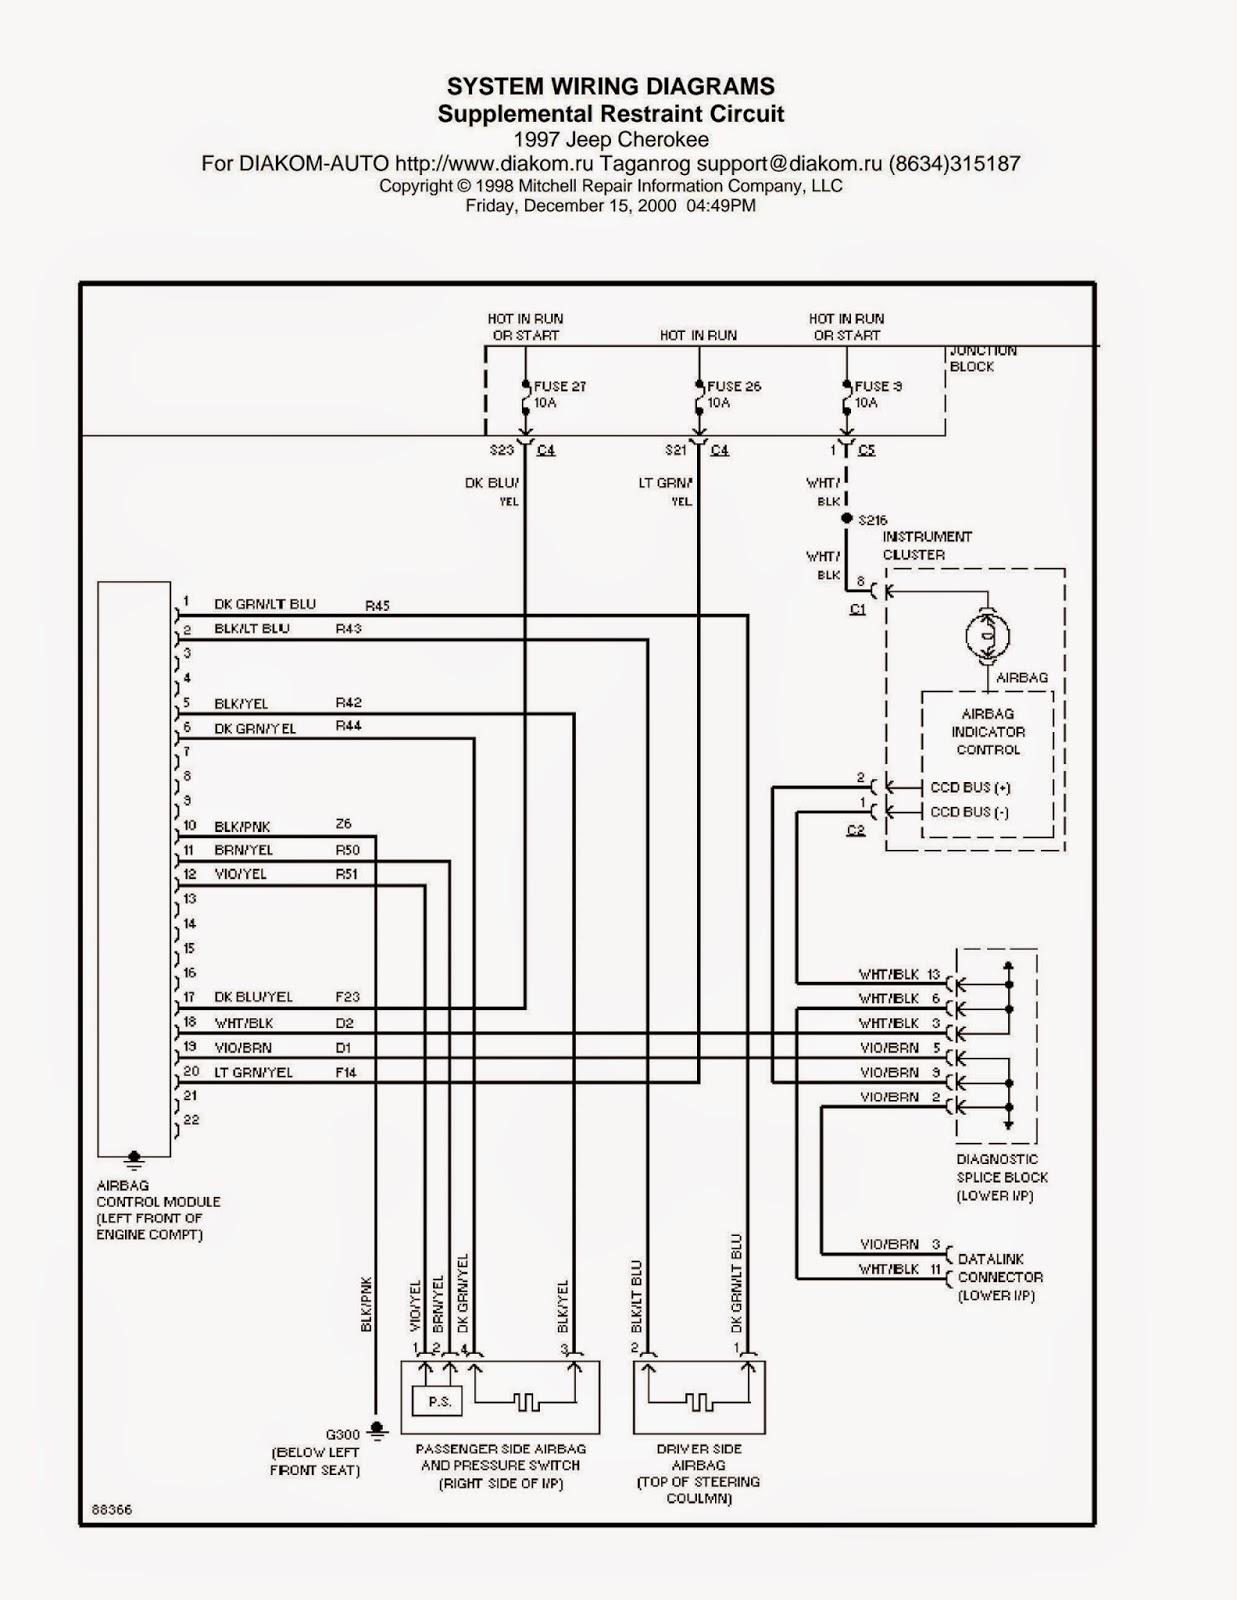 Wiring Diagram 1988 Ford Ranger Wiring Diagram Ford Bronco Wiring